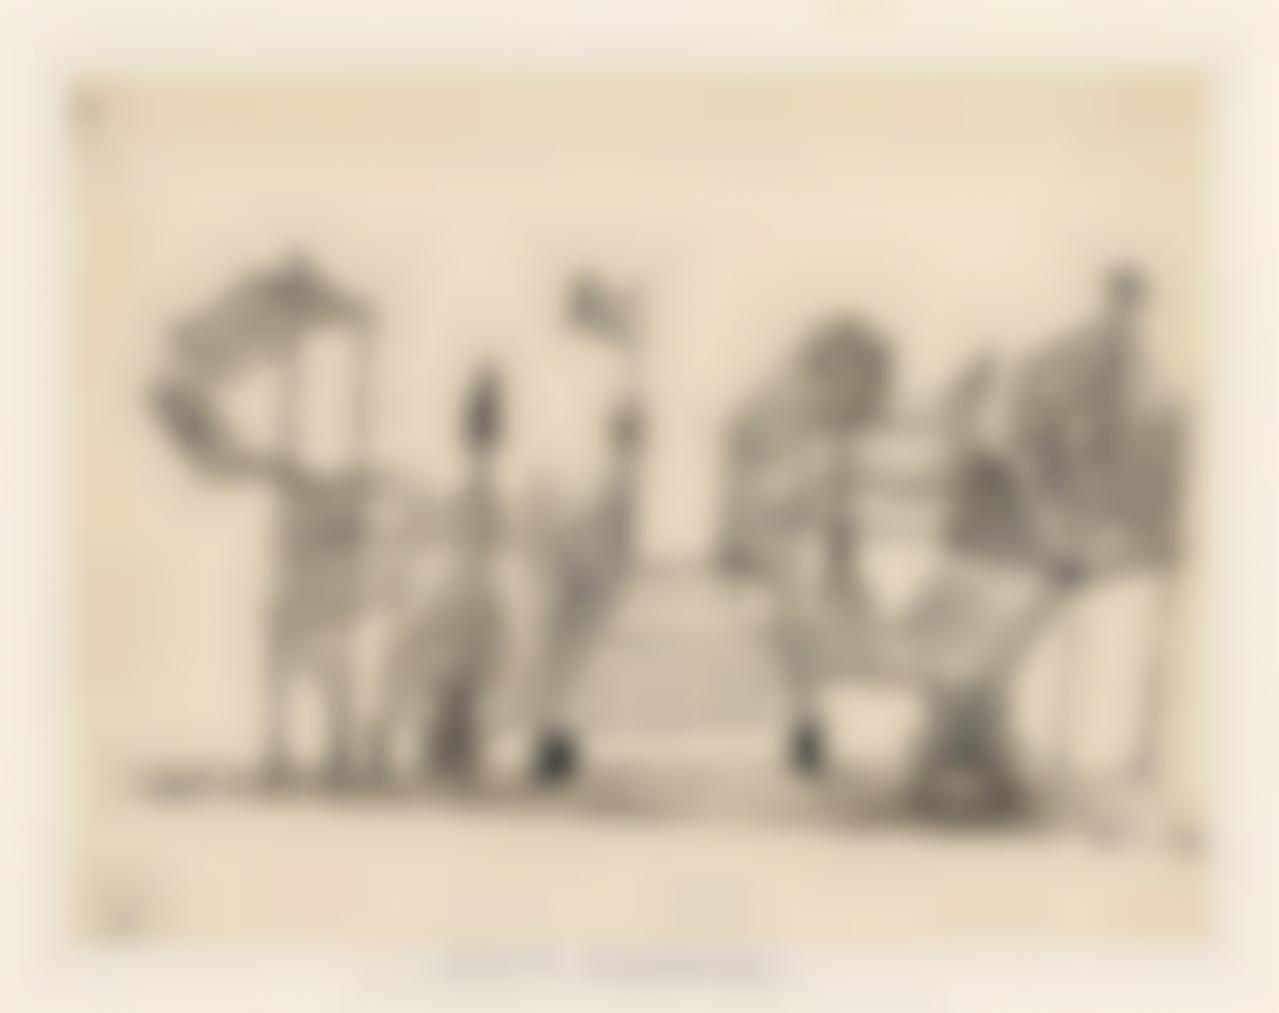 Paul Klee-Heimgartenanlage (Home Garden Plot)-1921